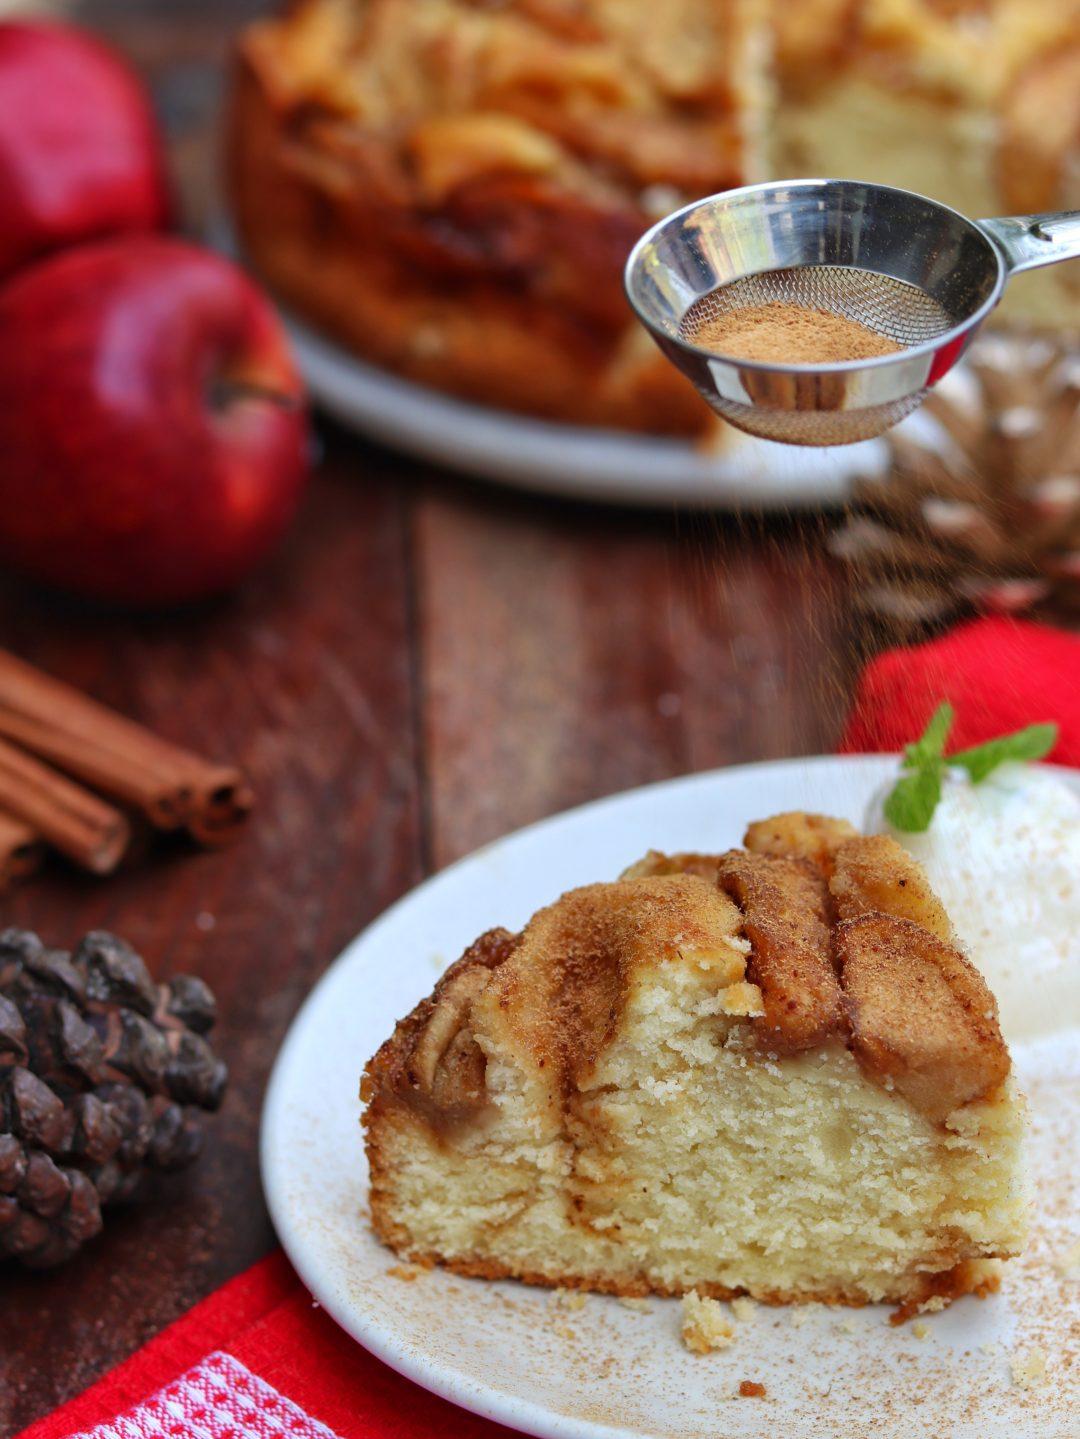 Spiced Apple Cinnamon Cake